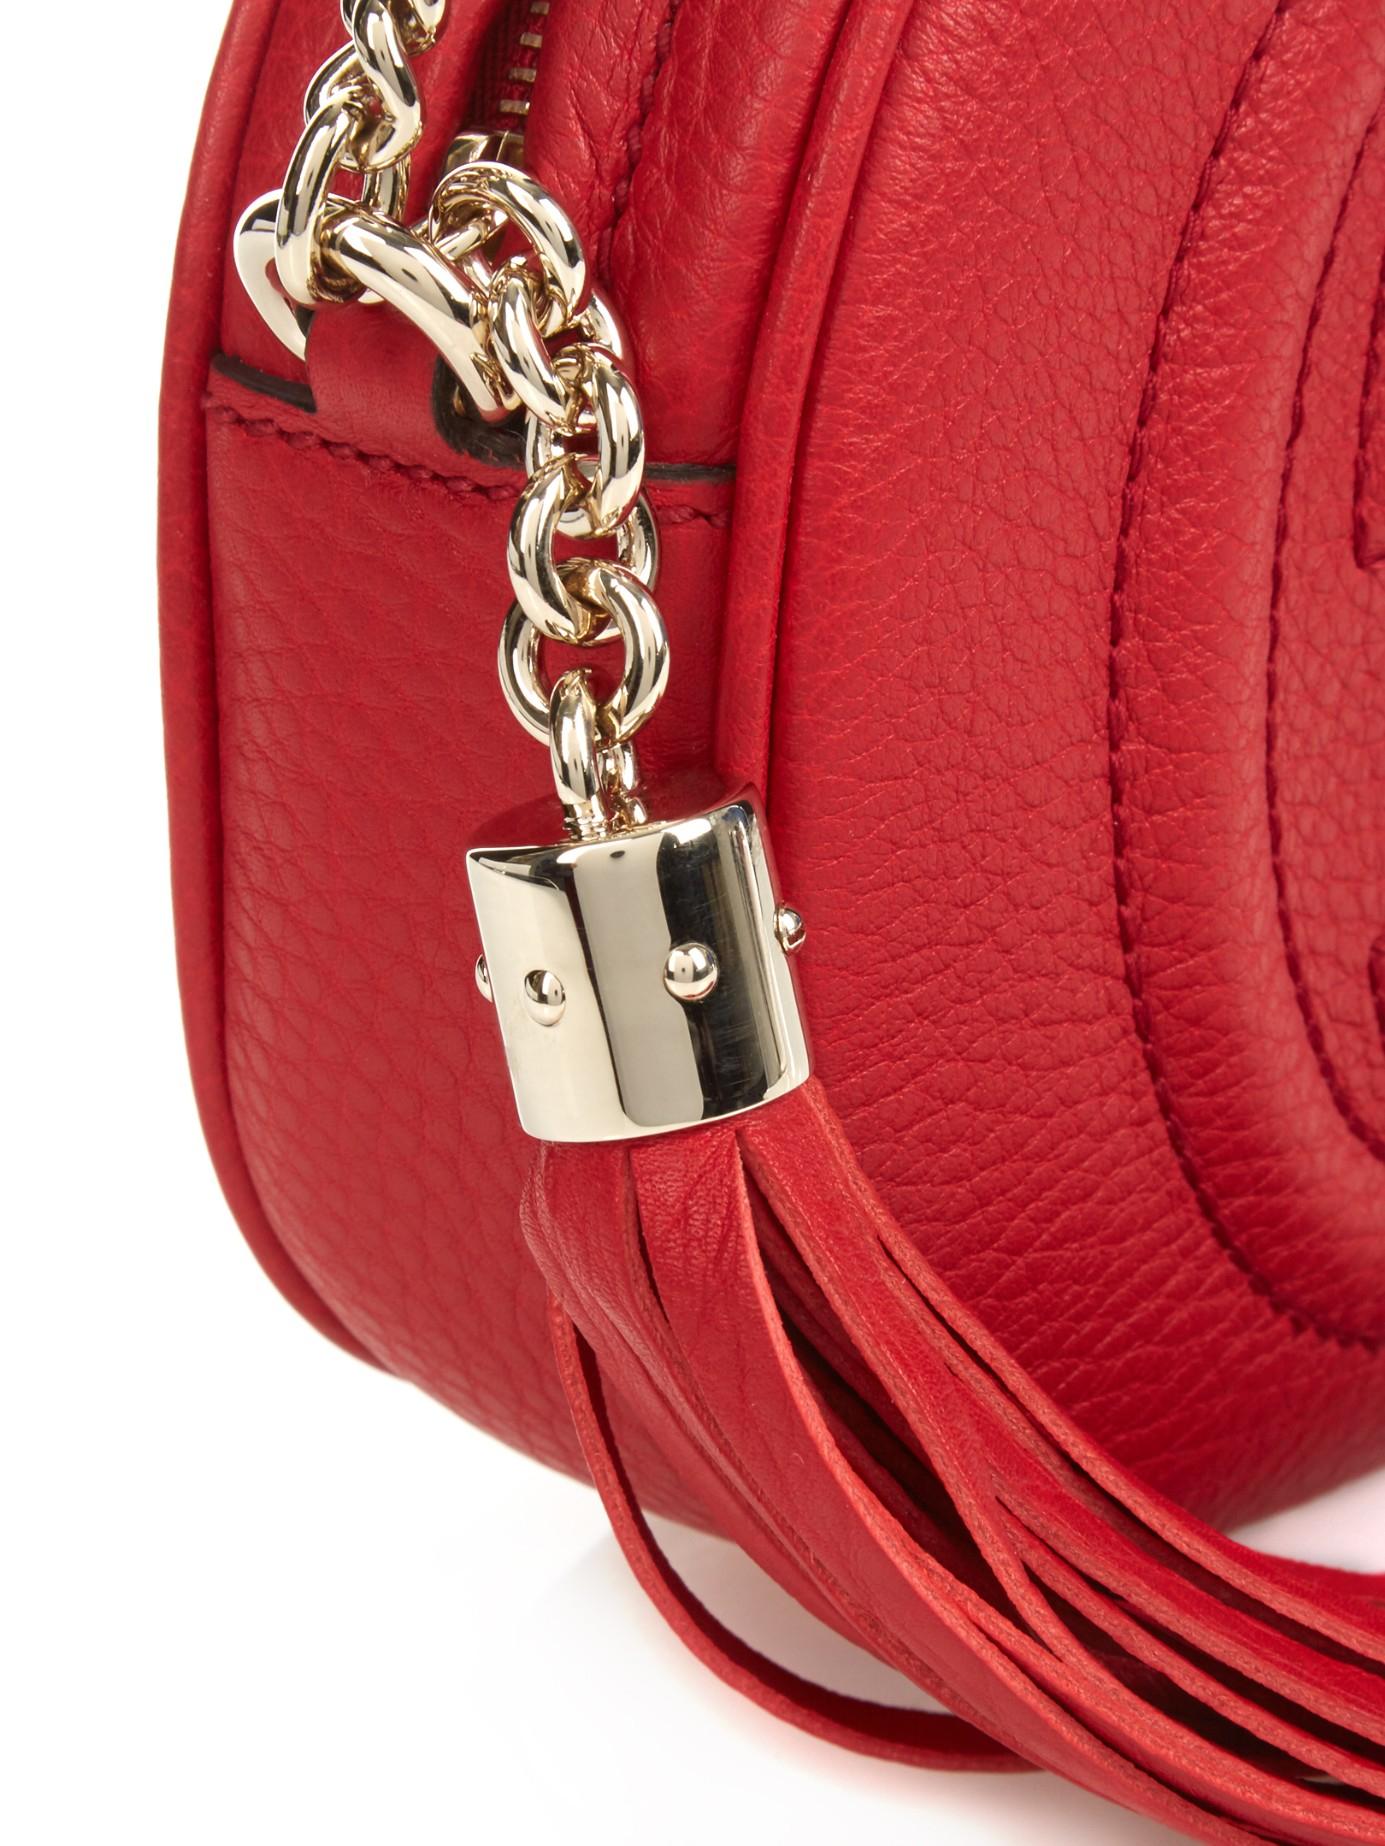 6828a6e9a5b96 Gallery. Previously sold at  MATCHESFASHION.COM · Women s Gucci Soho Bag